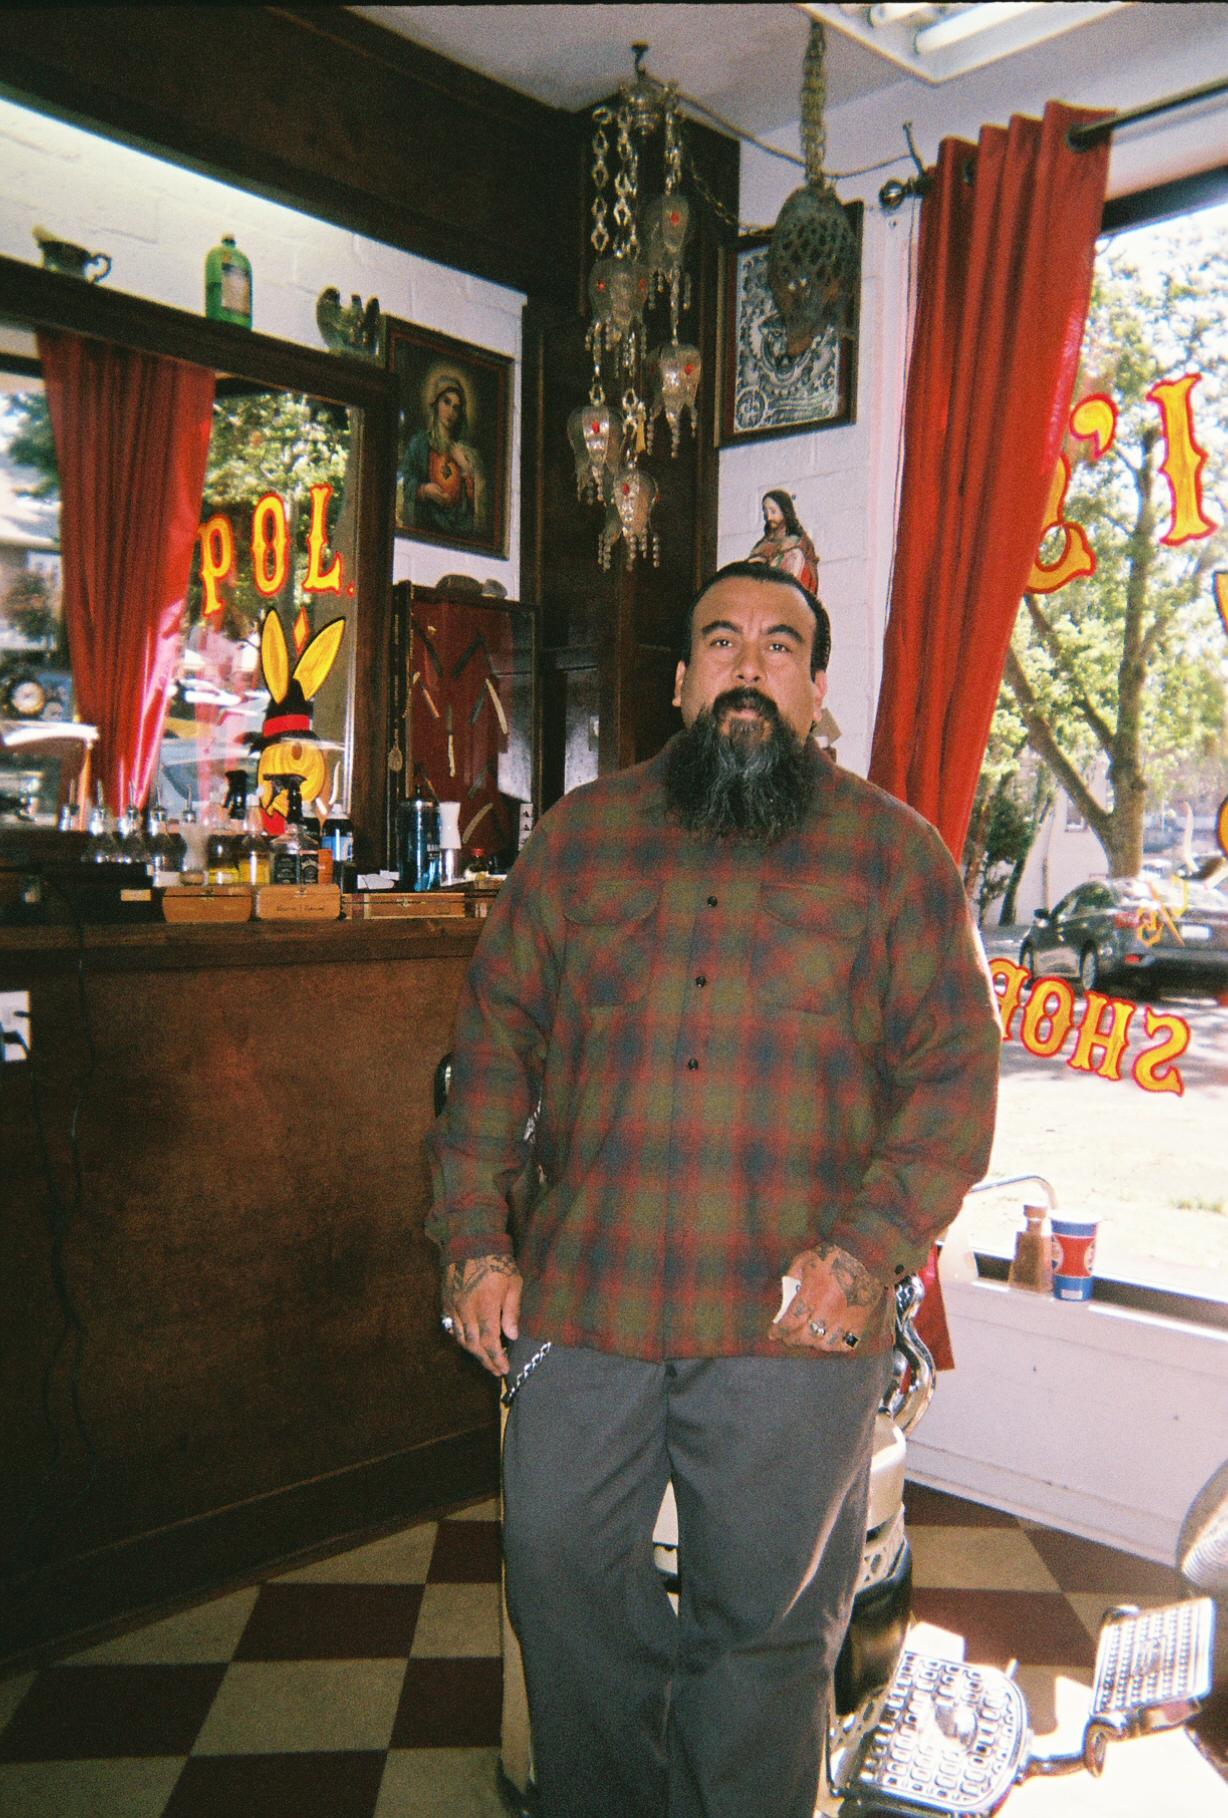 Poli's Barber Shop - Poli Guadarrama